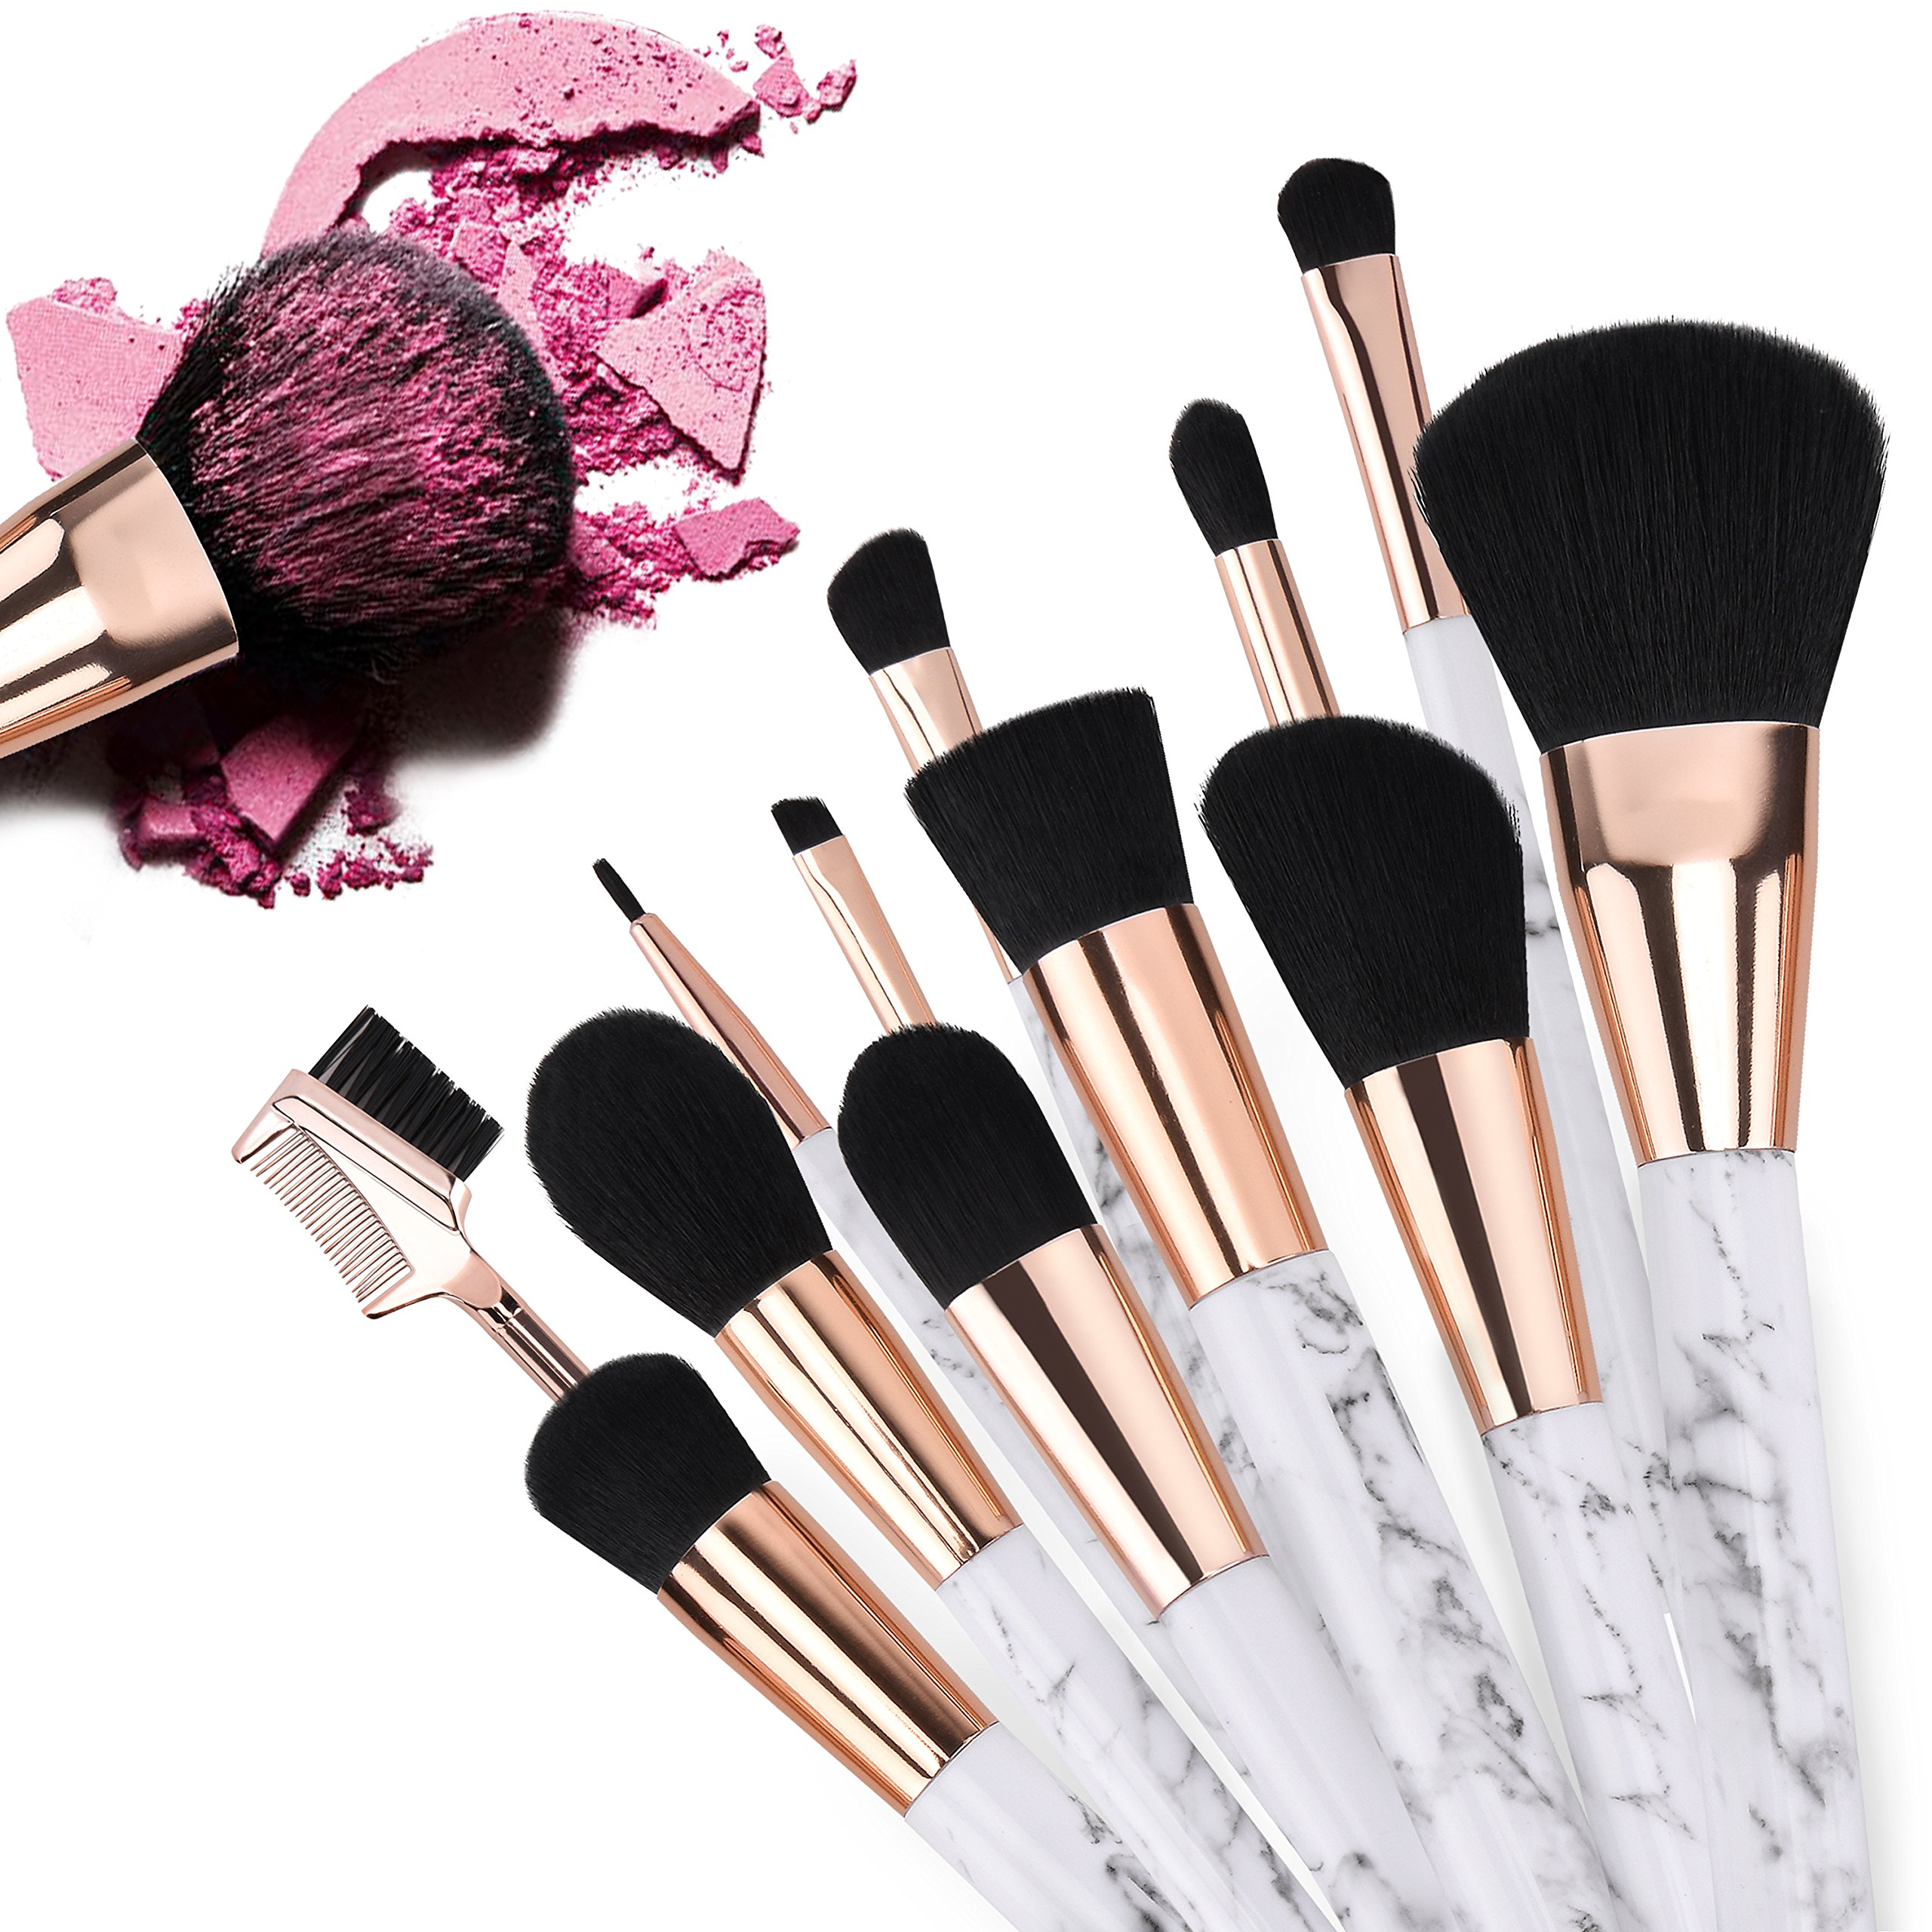 Make Up Brushes, Safe&Care 12 Pieces Start Makers Marble Makeup Brushes Set Foundation Blending Blush Eye Face Liquid Powder Cream Cosmetics Brushes Kit for Women Or Girls